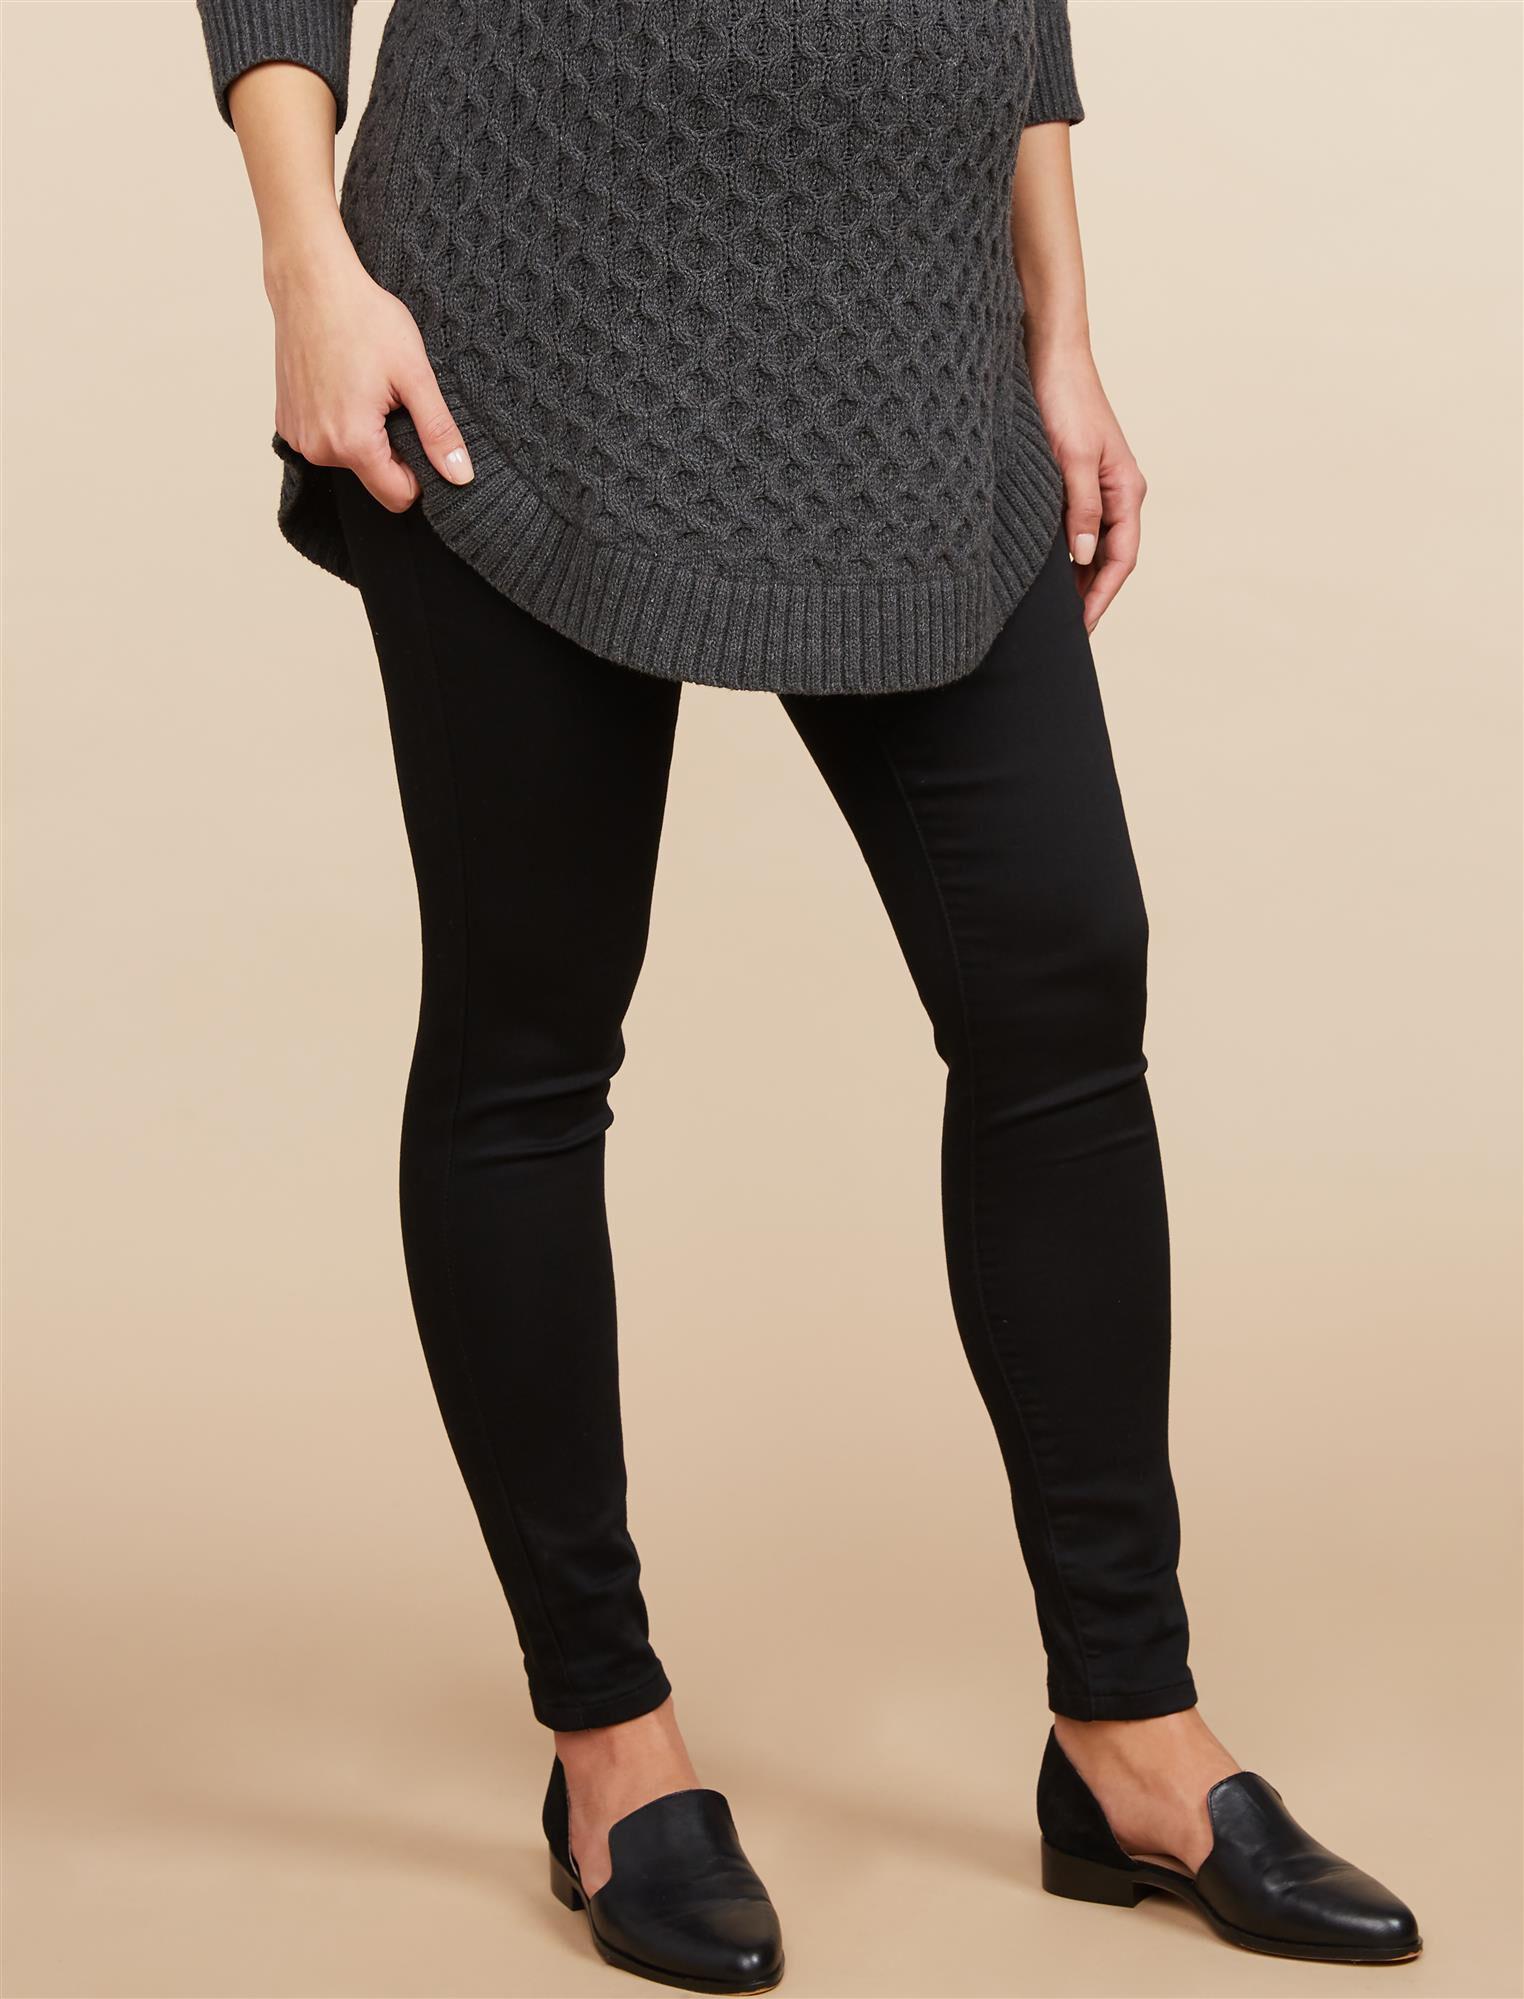 Secret Fit Belly Skinny Twill Maternity Pants- Black